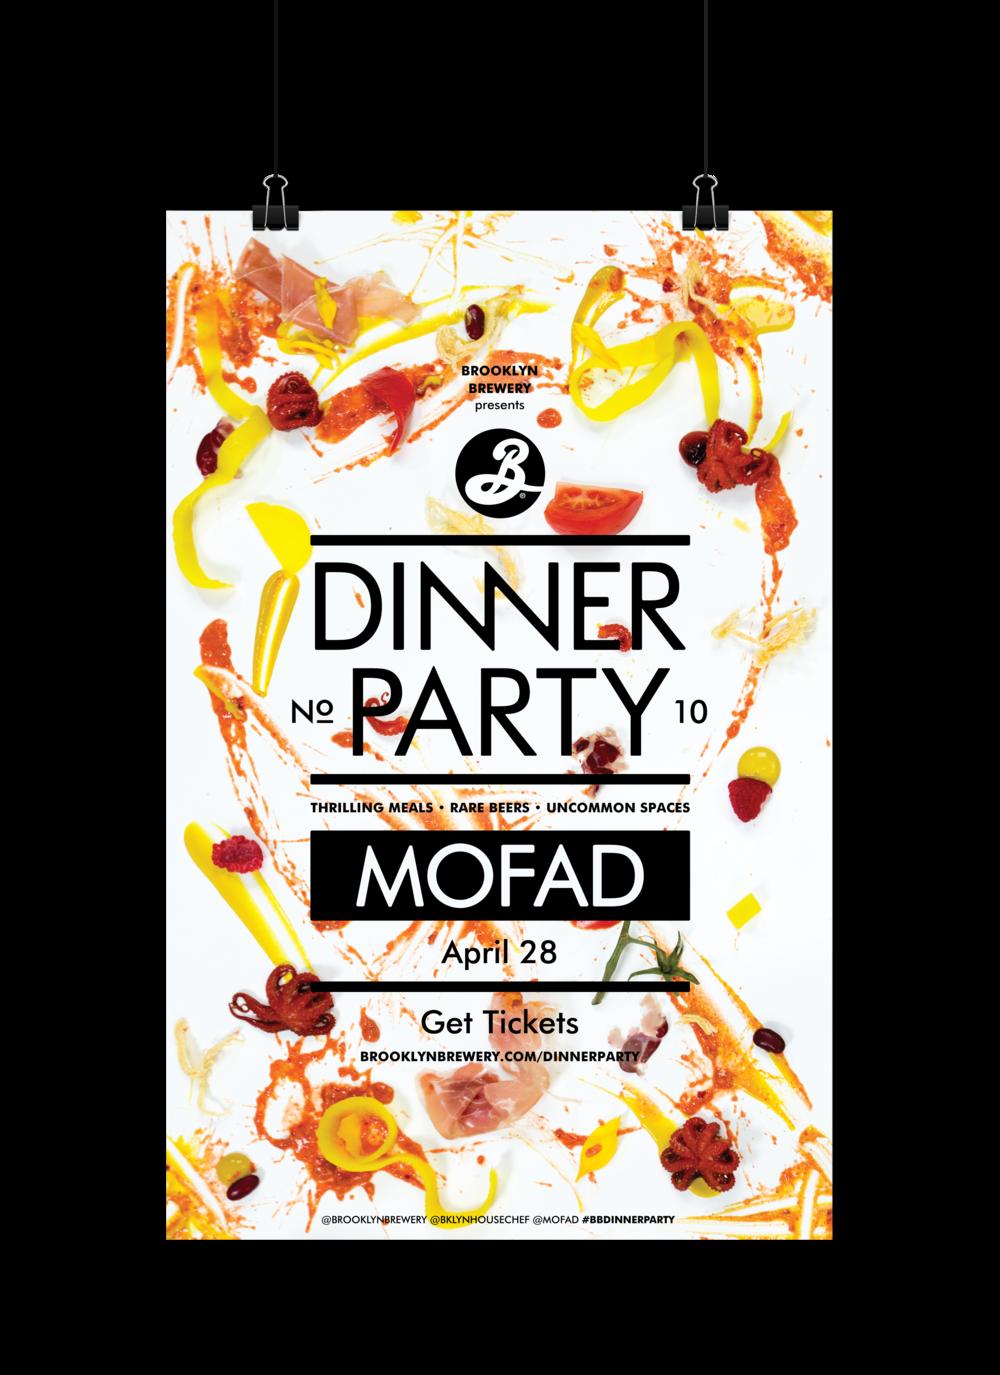 DP-10-MOFAD-Poster-Mockup.png